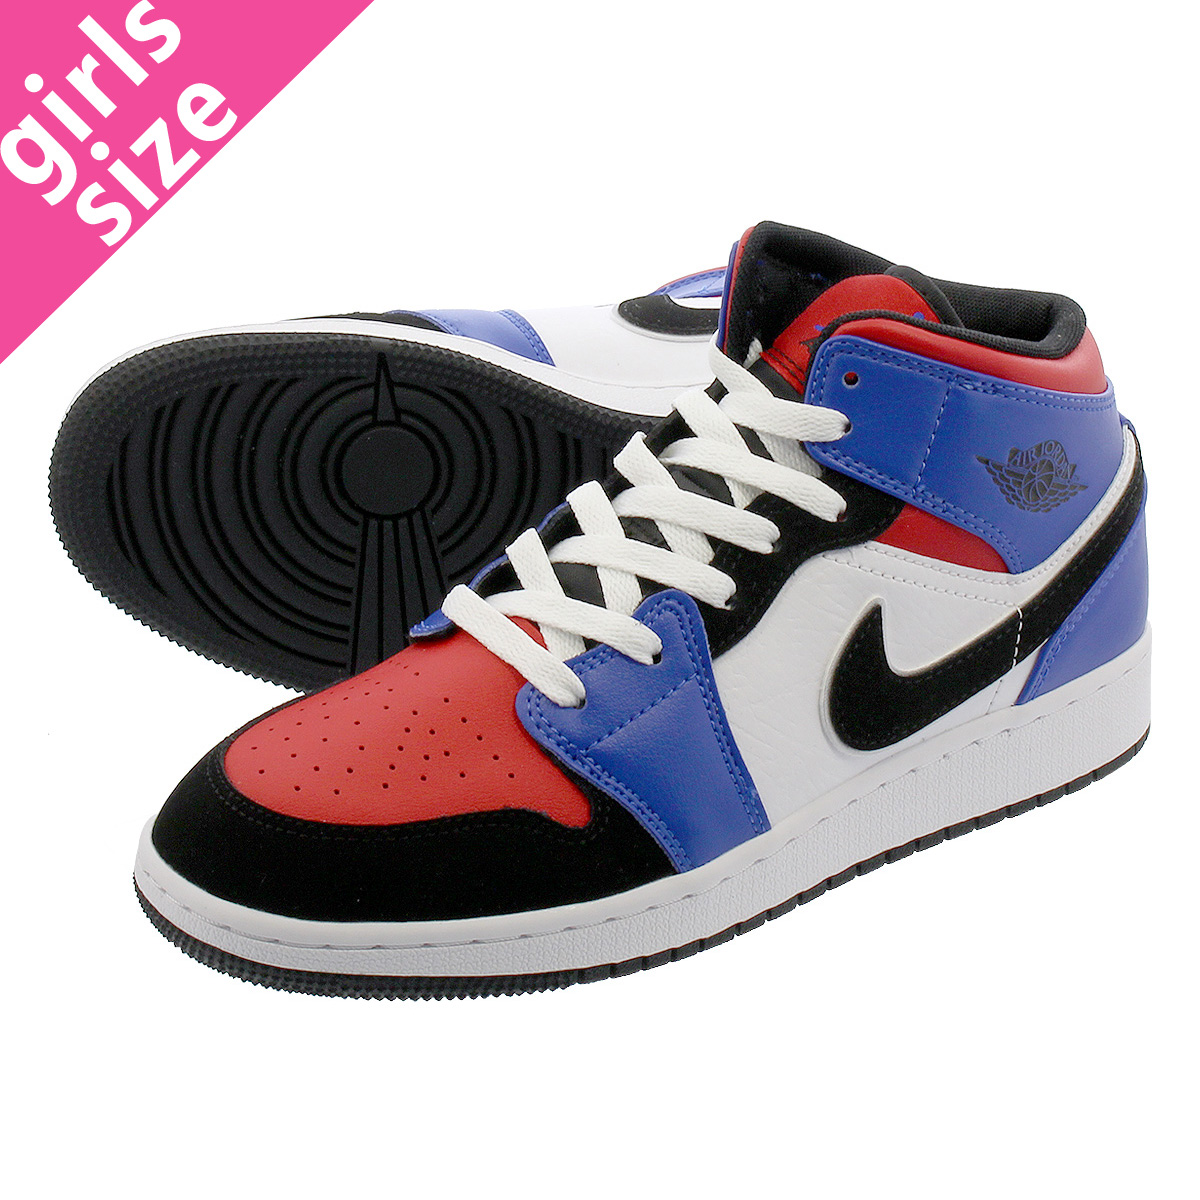 3792203a4c3 LOWTEX PLUS  NIKE AIR JORDAN 1 MID BG Nike Air Jordan 1 mid BG  WHITE BLACK HYPER ROYAL 554